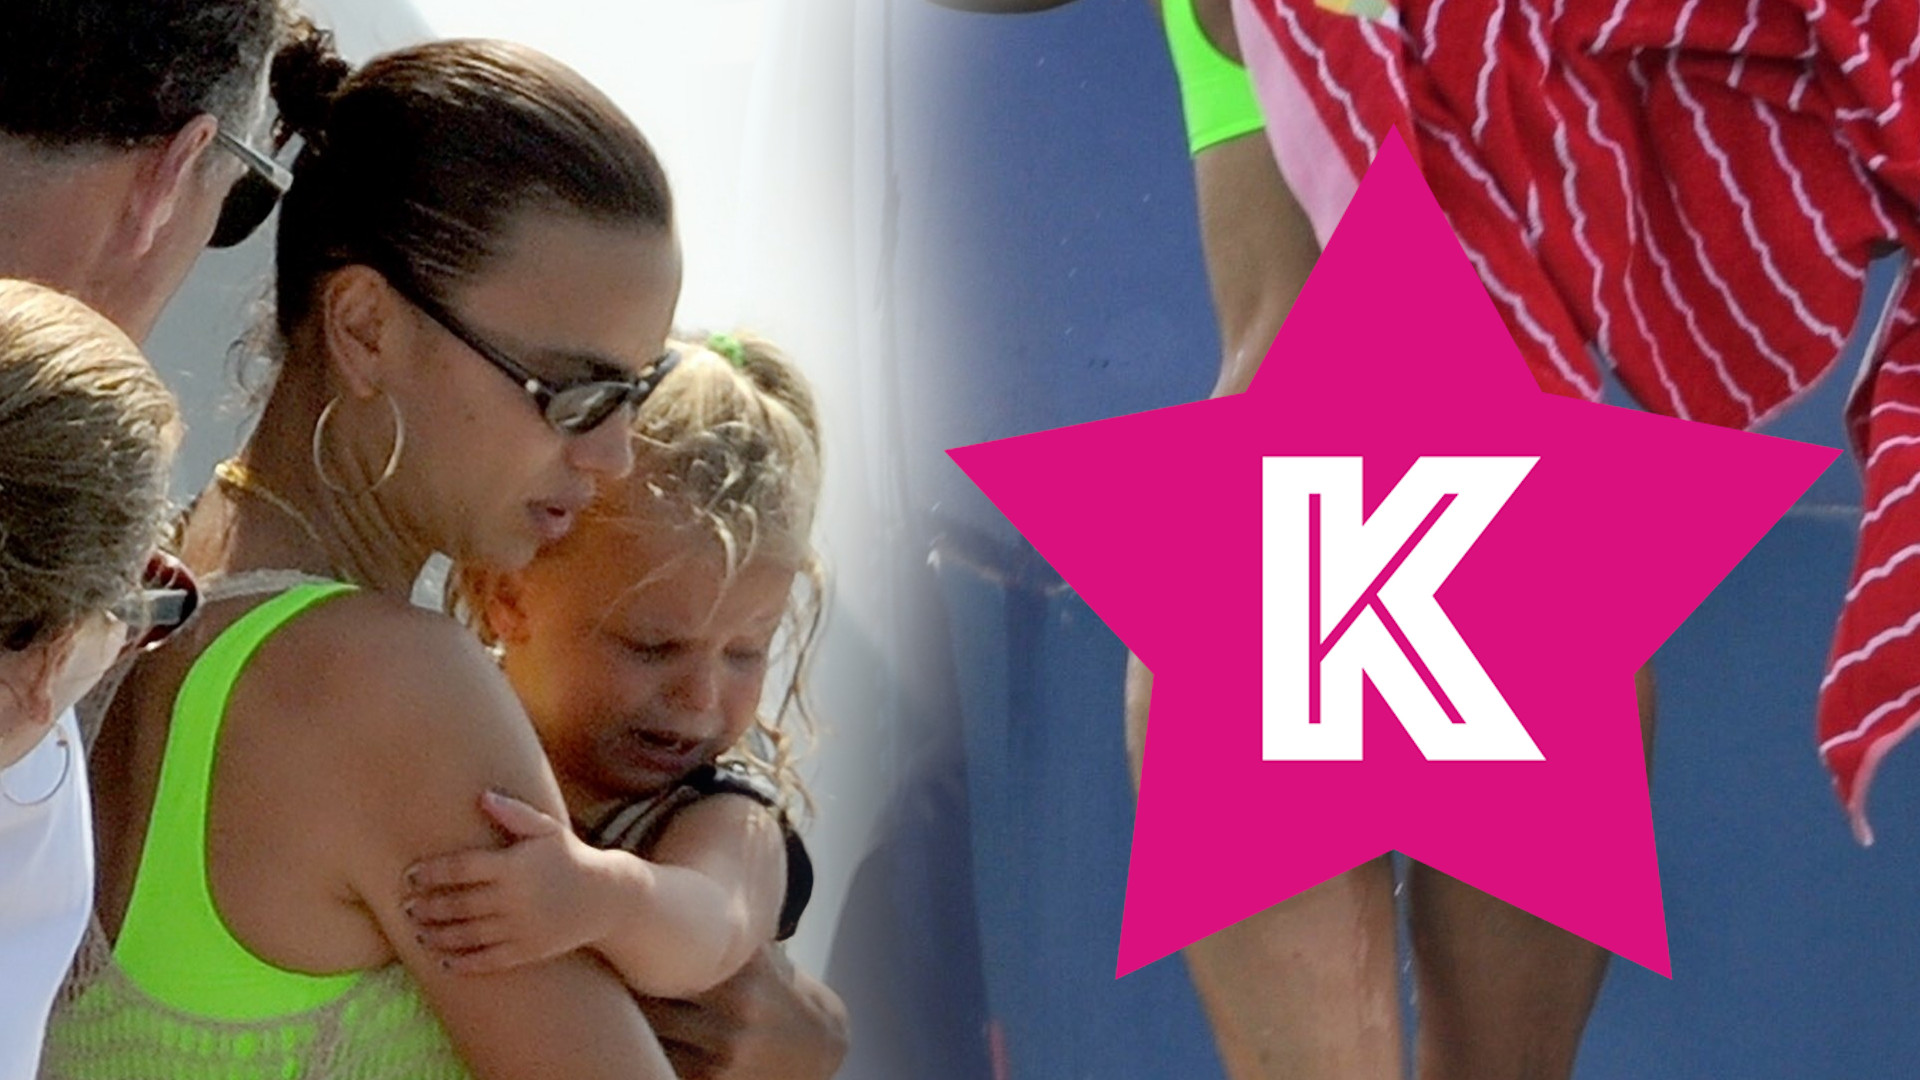 Co za PUPA! Irina Shayk w BIKINI na wakacjach z córką